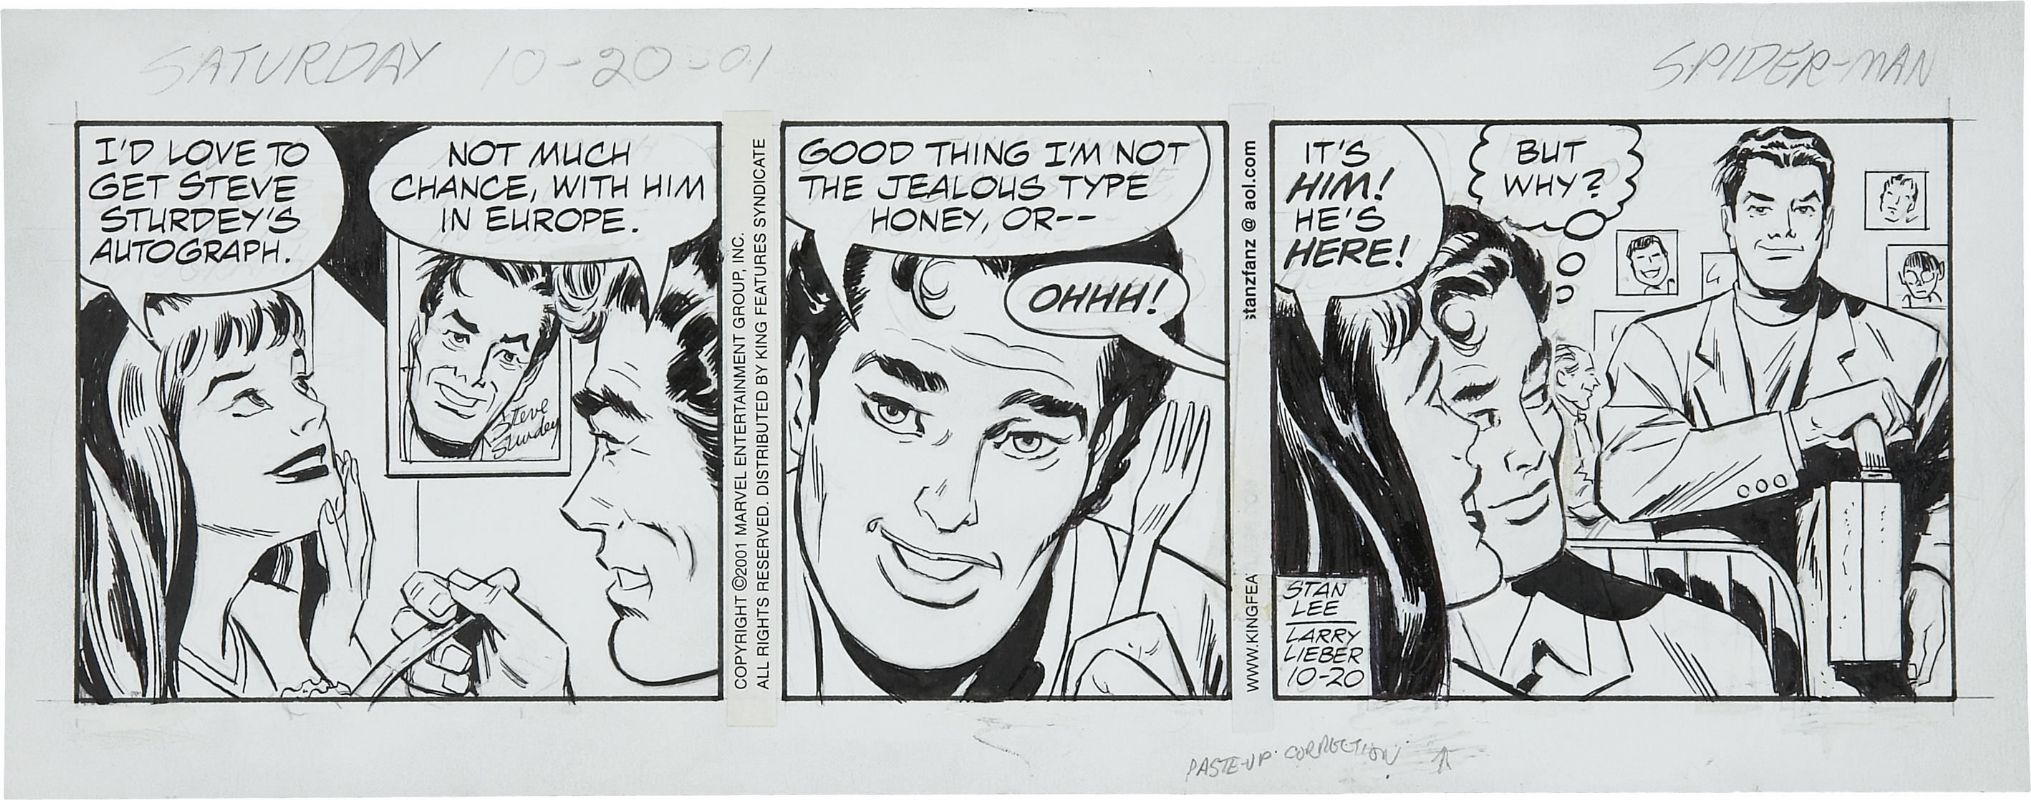 Amazing spiderman comic strip images 751